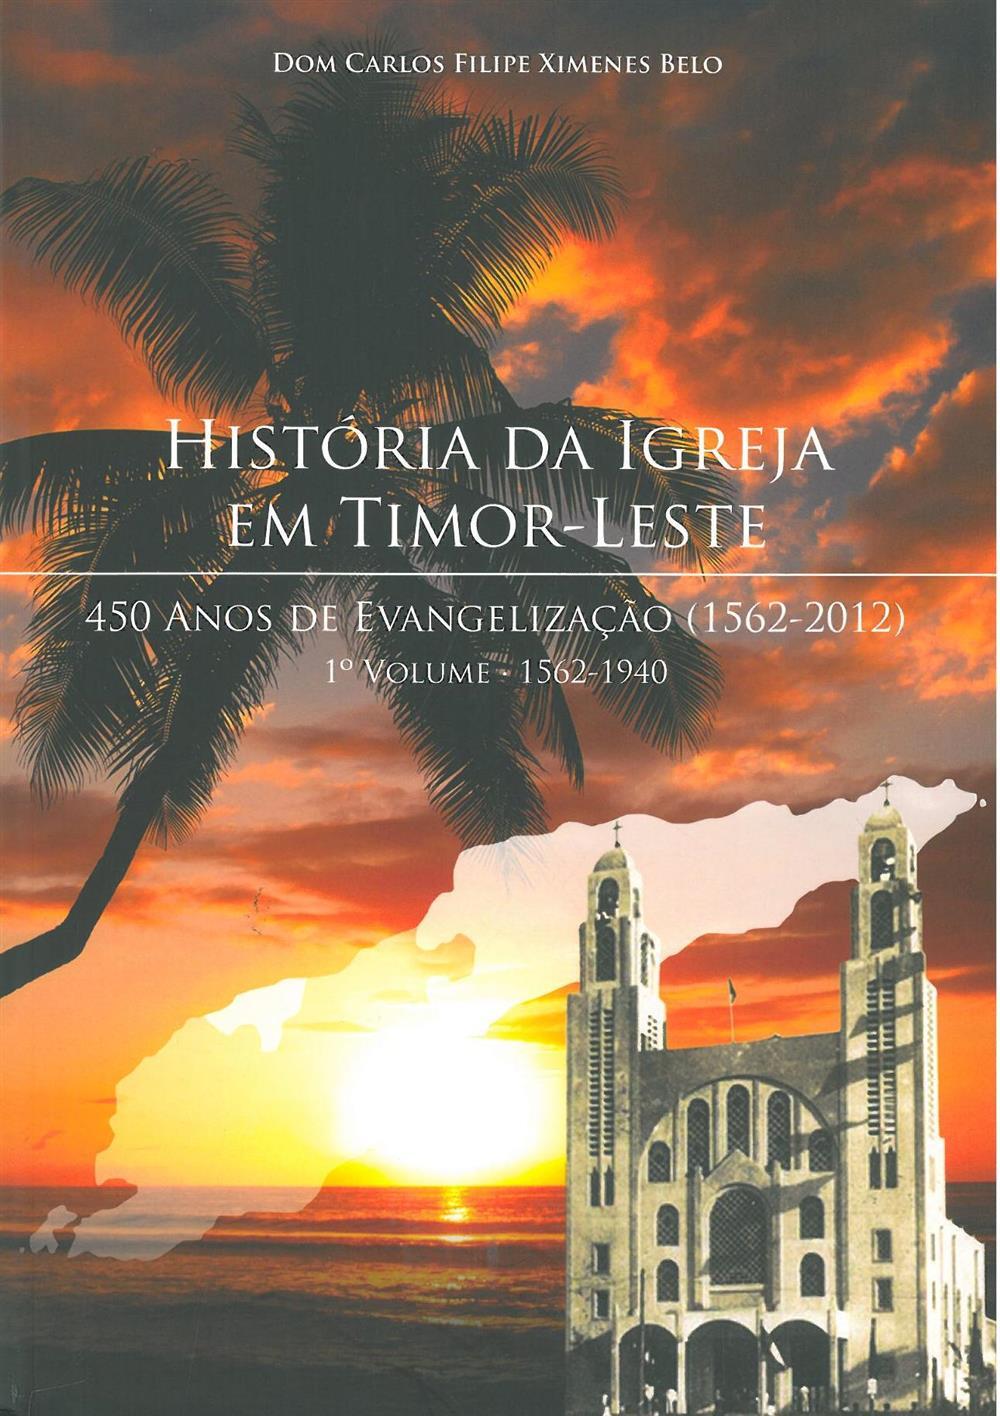 História da Igreja em Timor-Leste_.jpg